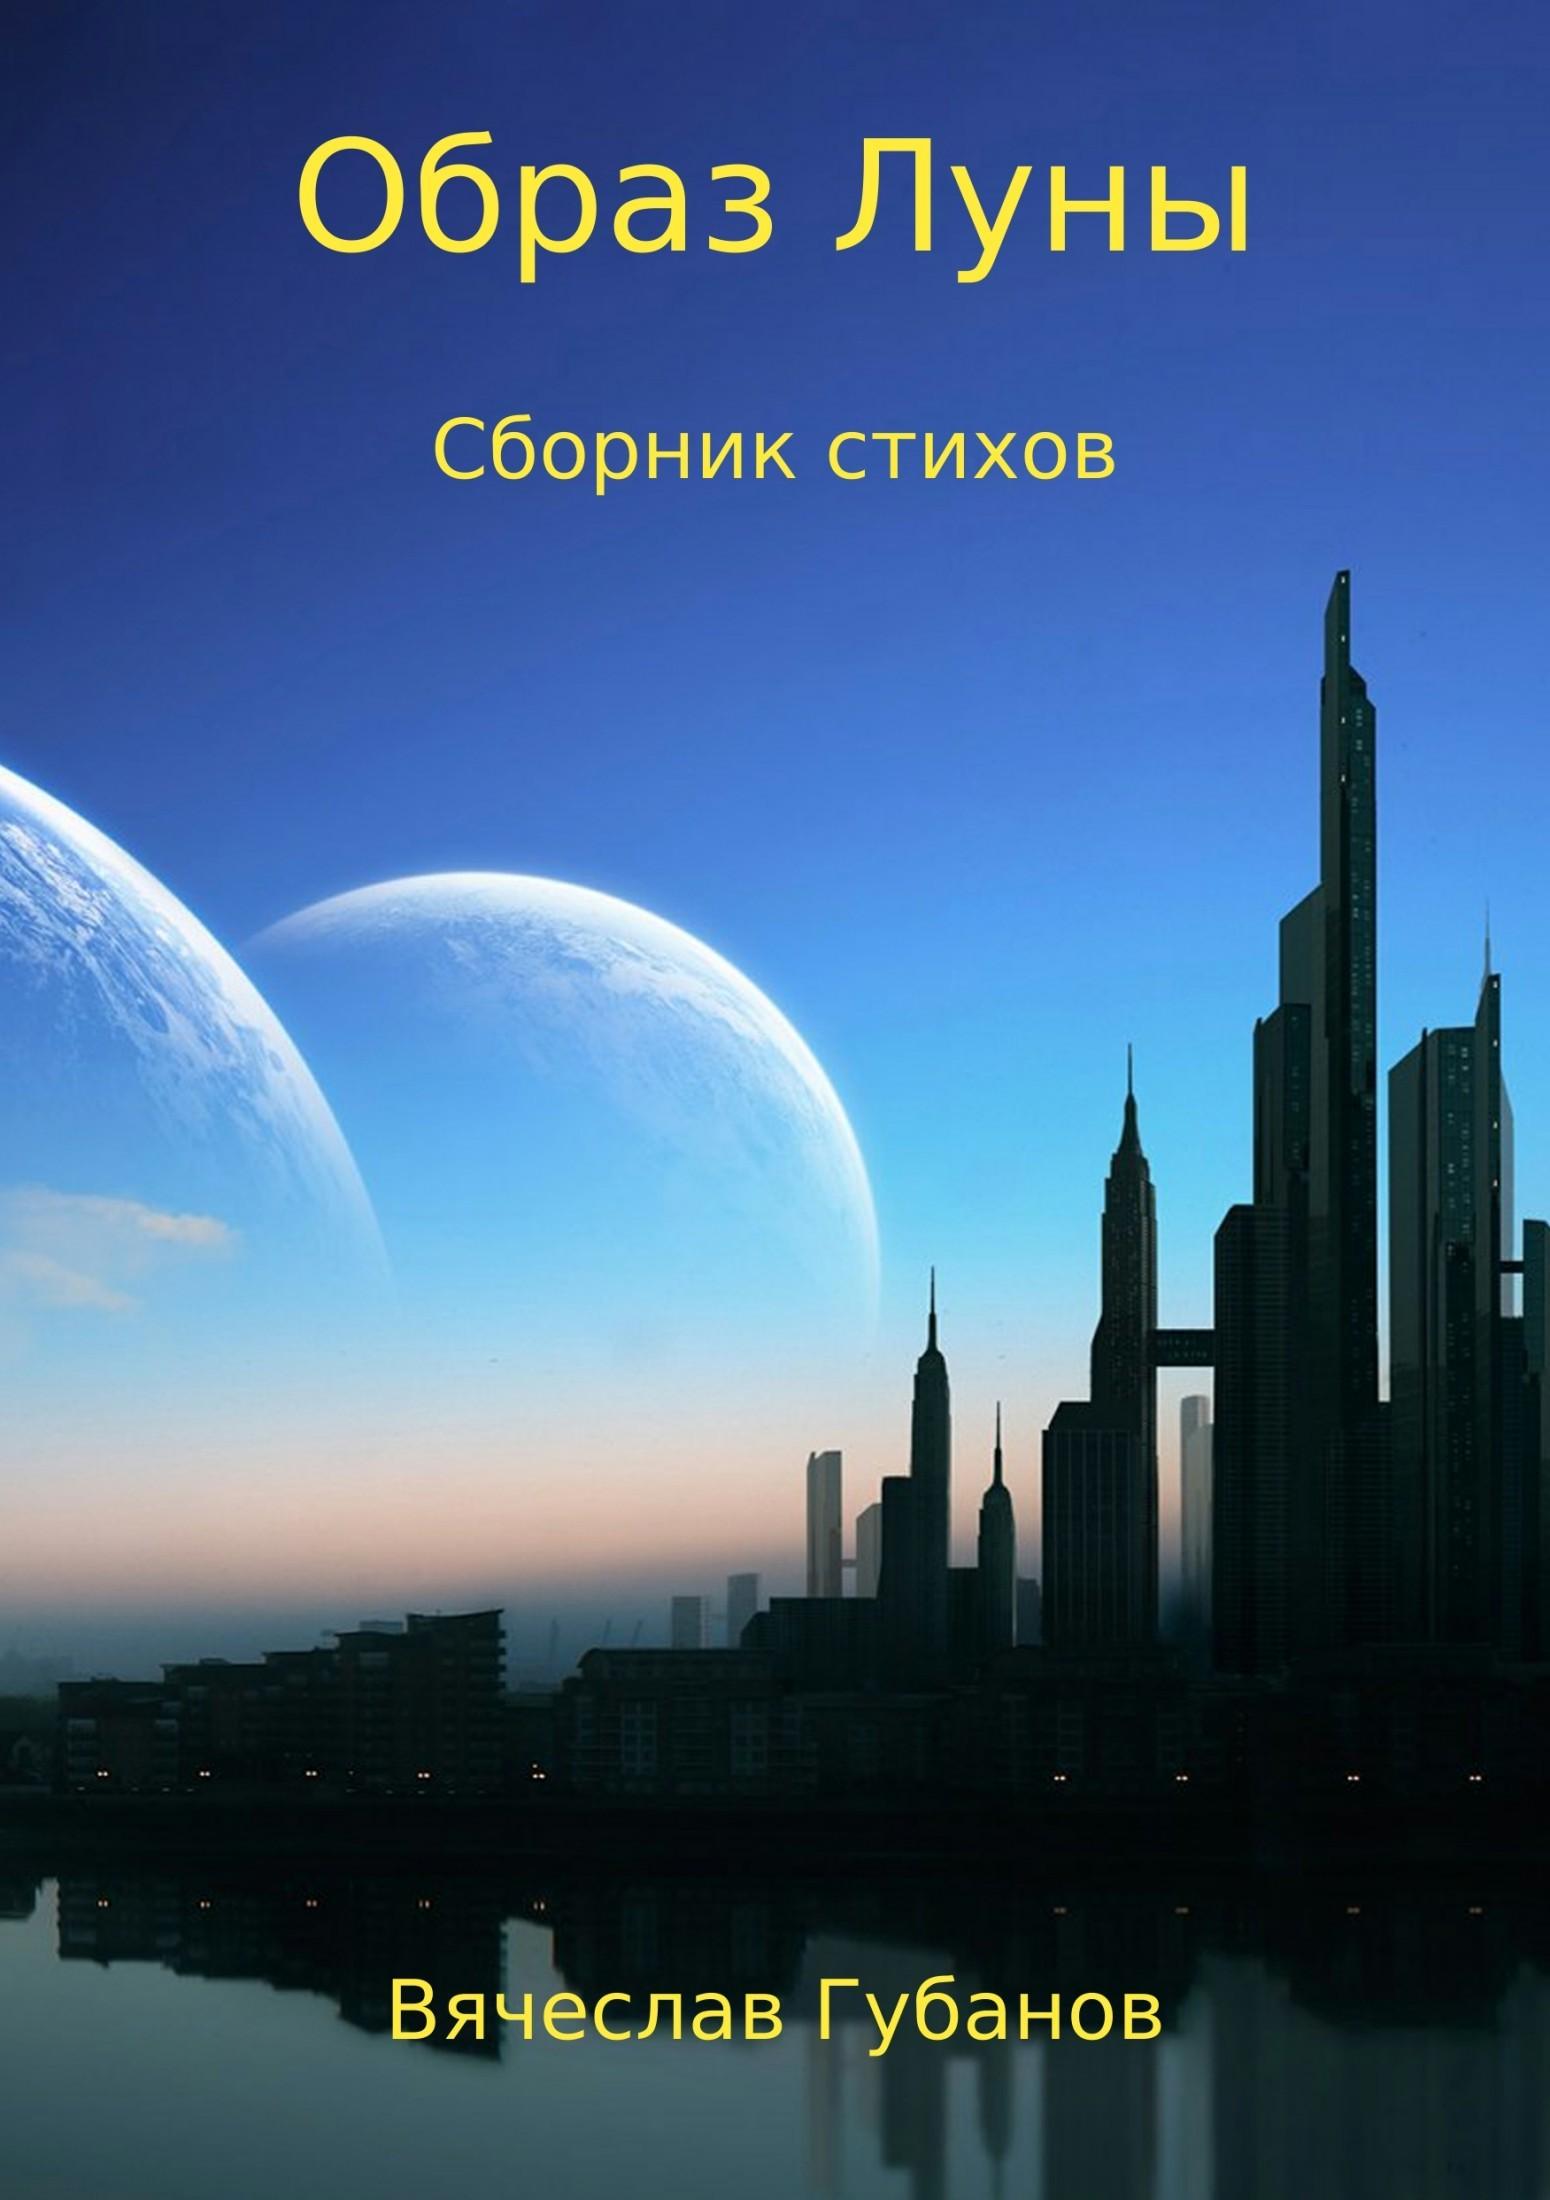 Шикарная заставка для романа 33/54/07/33540759.bin.dir/33540759.cover.jpg обложка